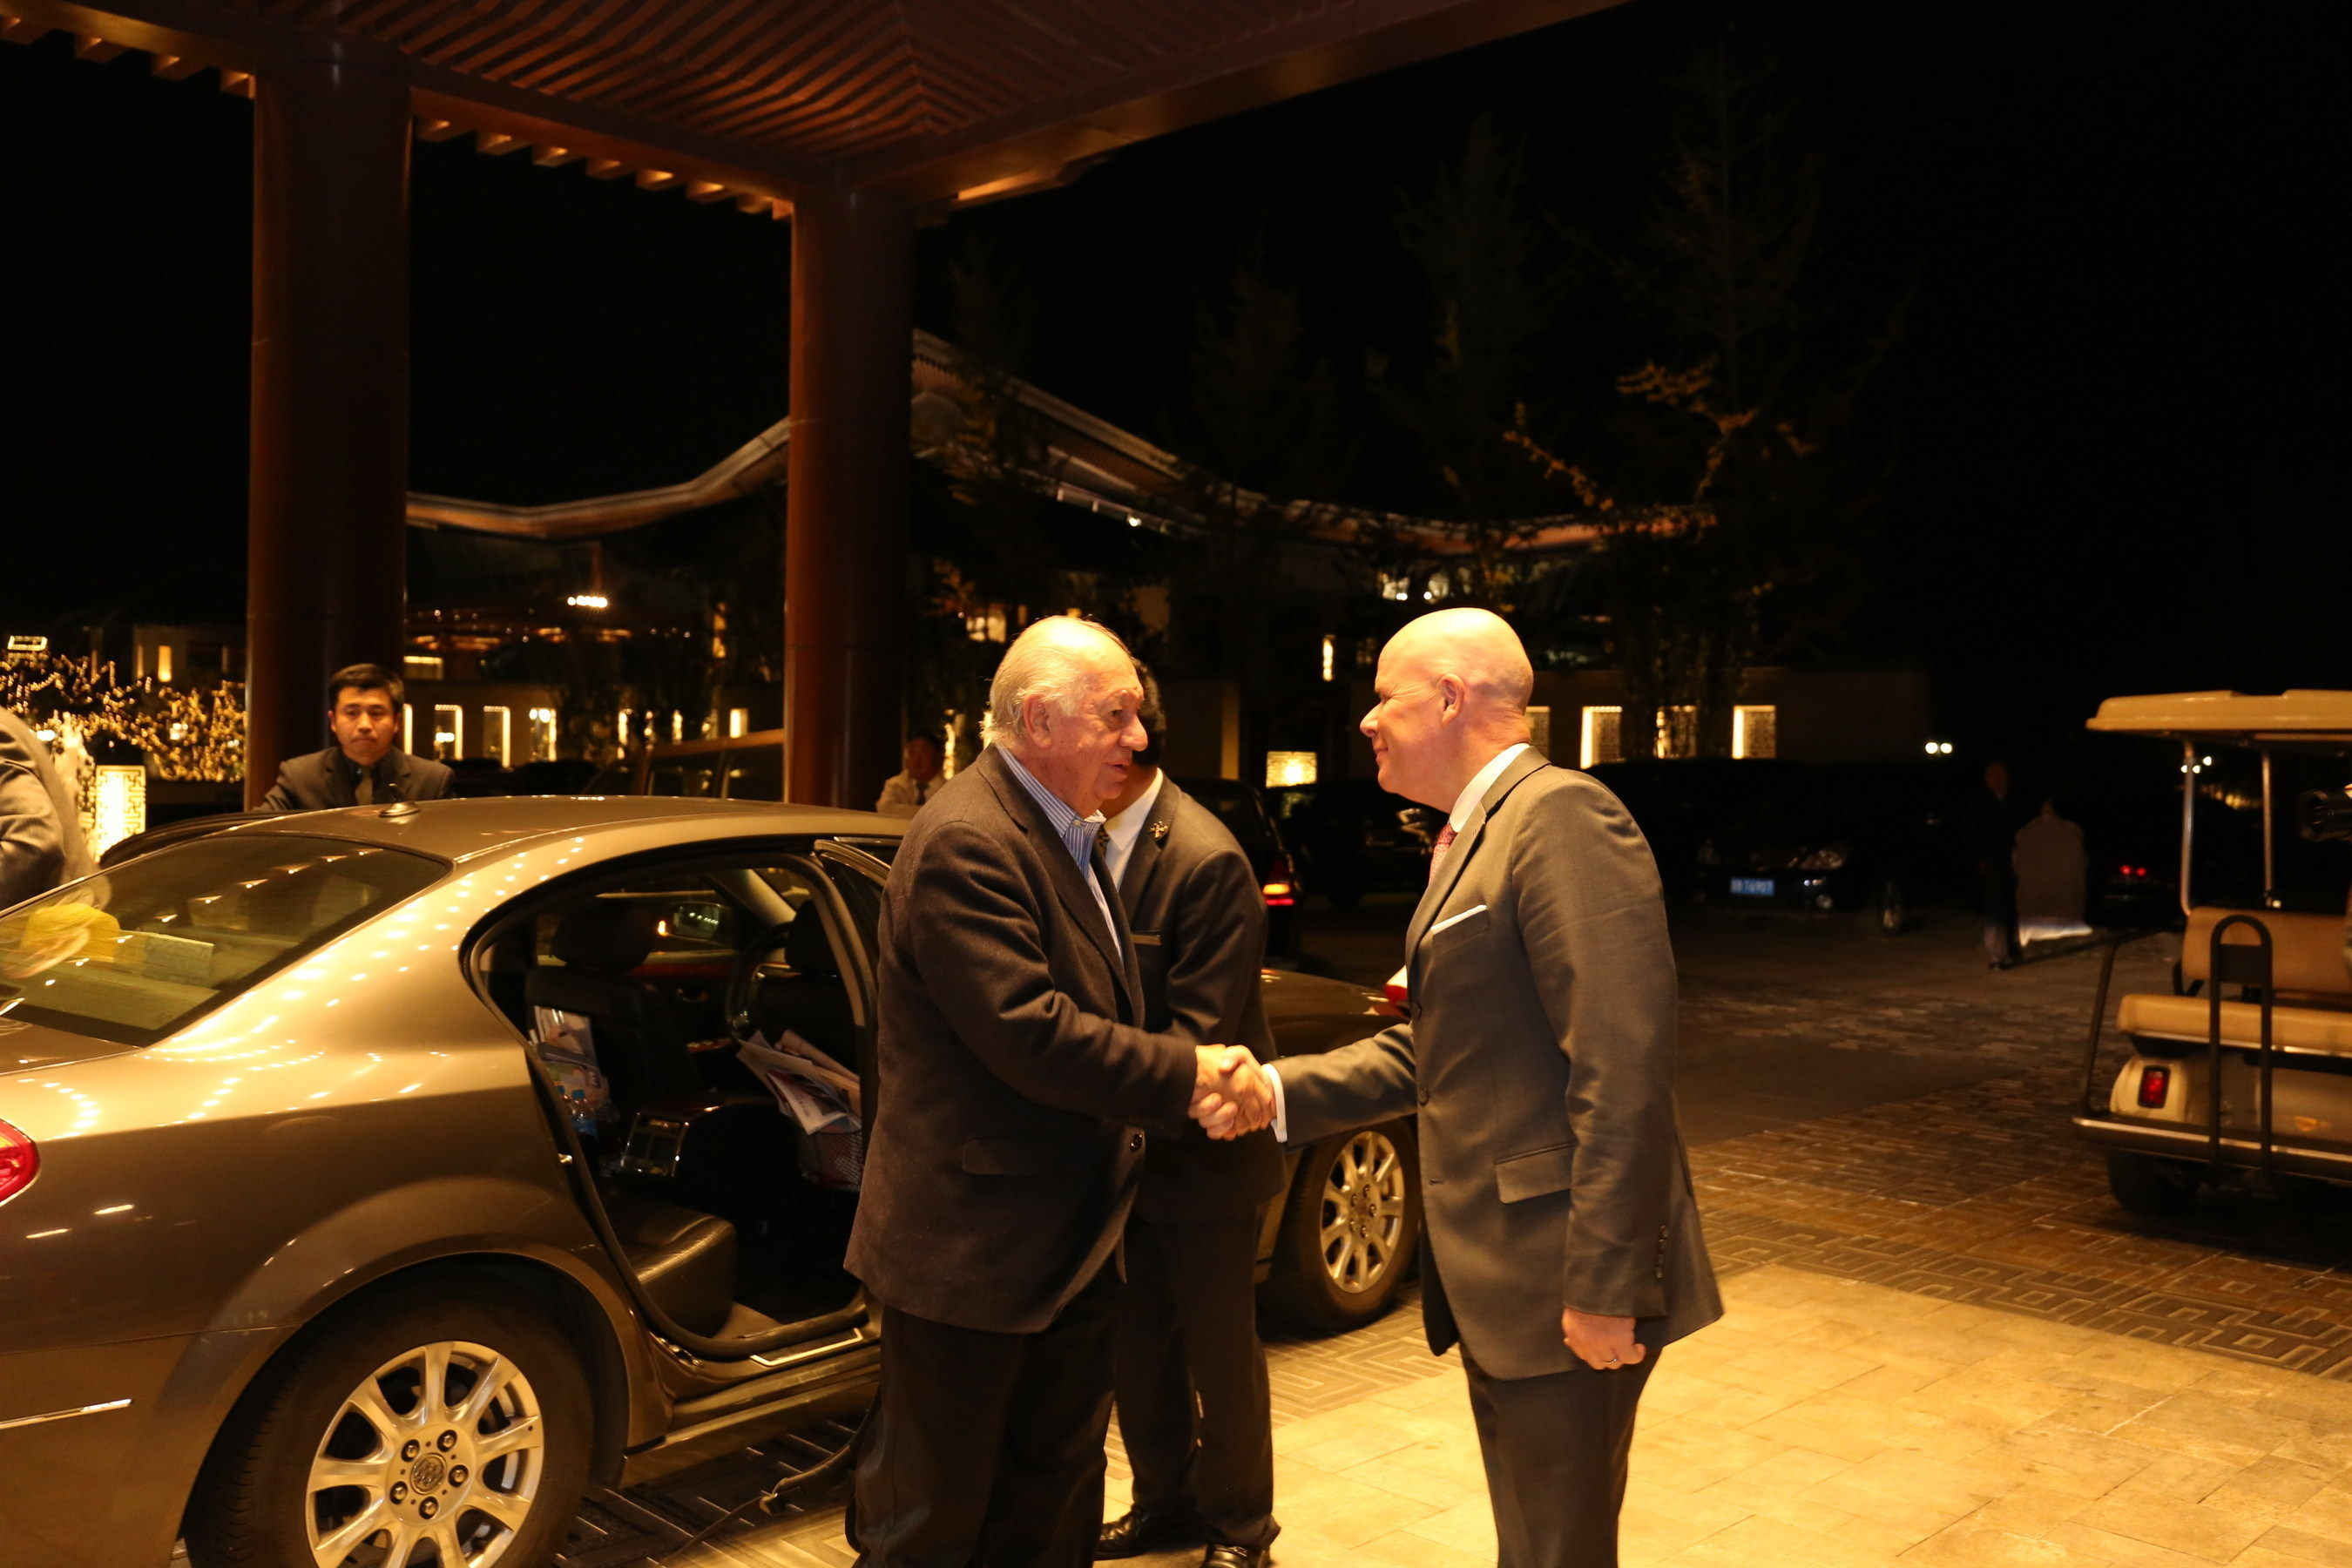 Former President of Chile Ricardo Lagos welcomed by Brice Pean, GM of Sunrise Kempinski Hotel, Beijing & Yanqi ...